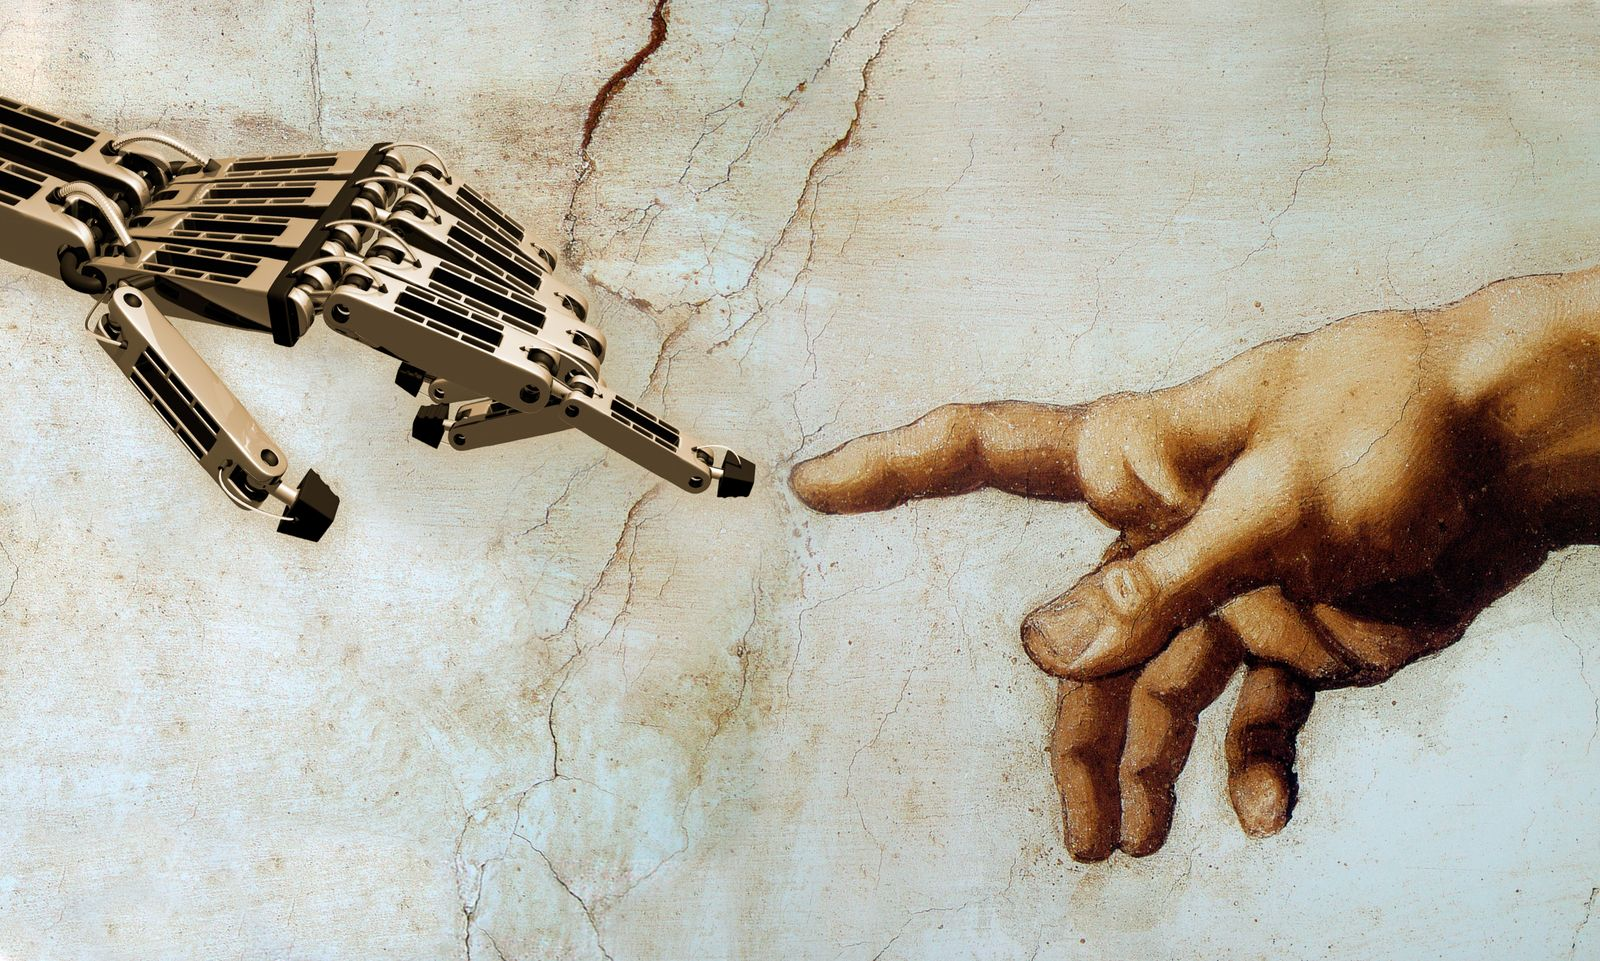 Michelangelo / Finger / Roboter / Hand / Technologie / Berührung